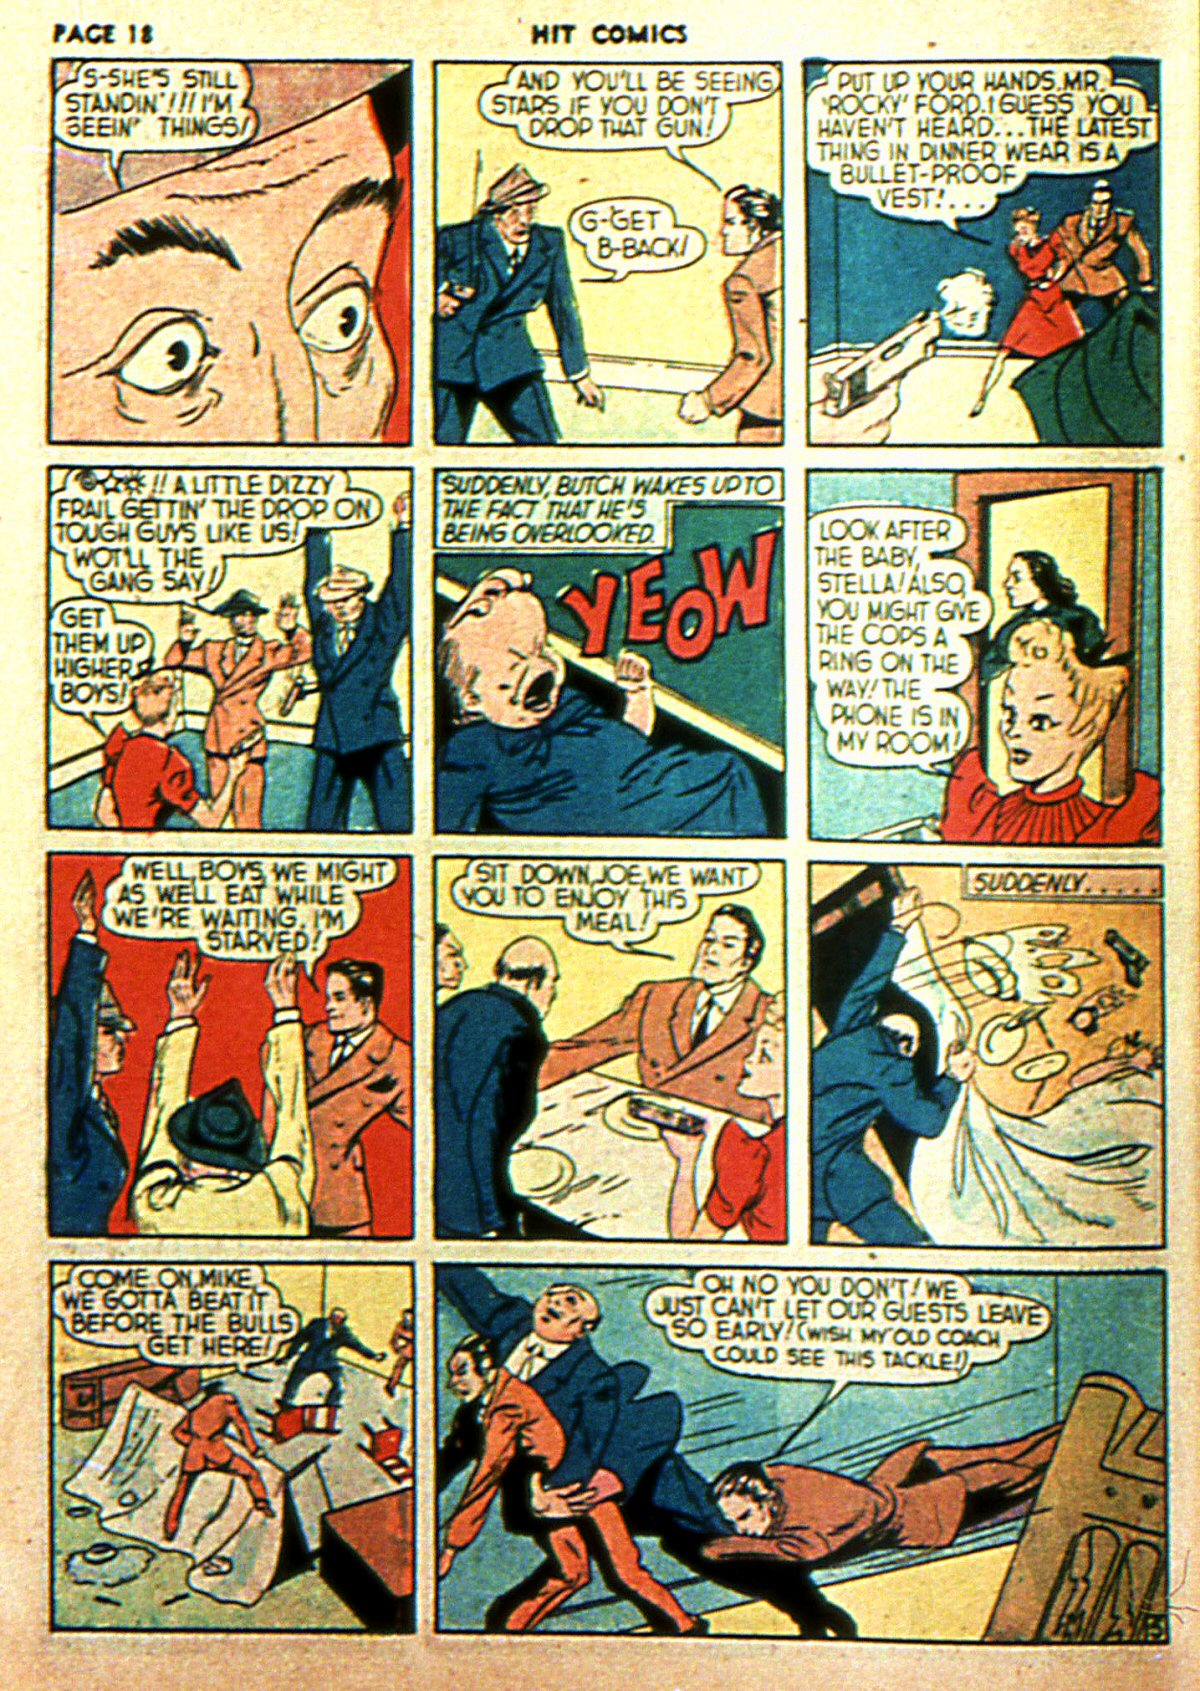 Read online Hit Comics comic -  Issue #2 - 20